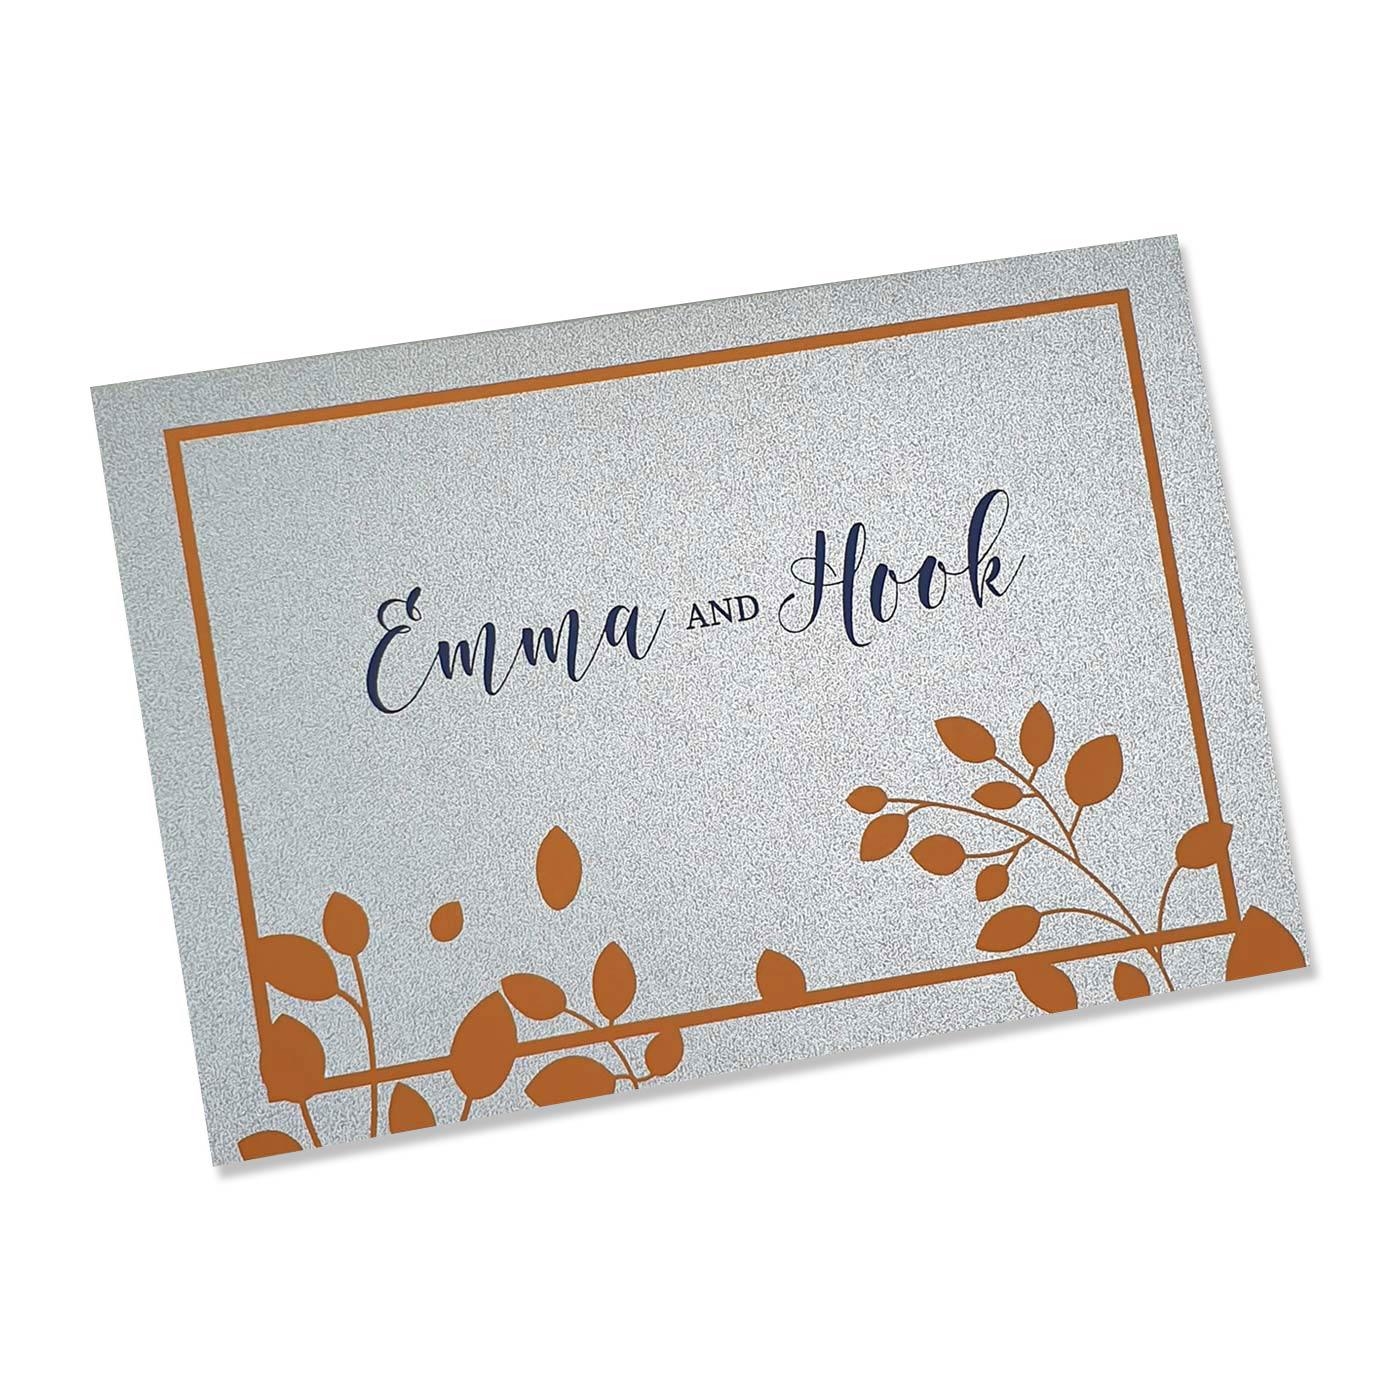 Thank You Cards : TYC-BOTANICAL - 123WeddingCards